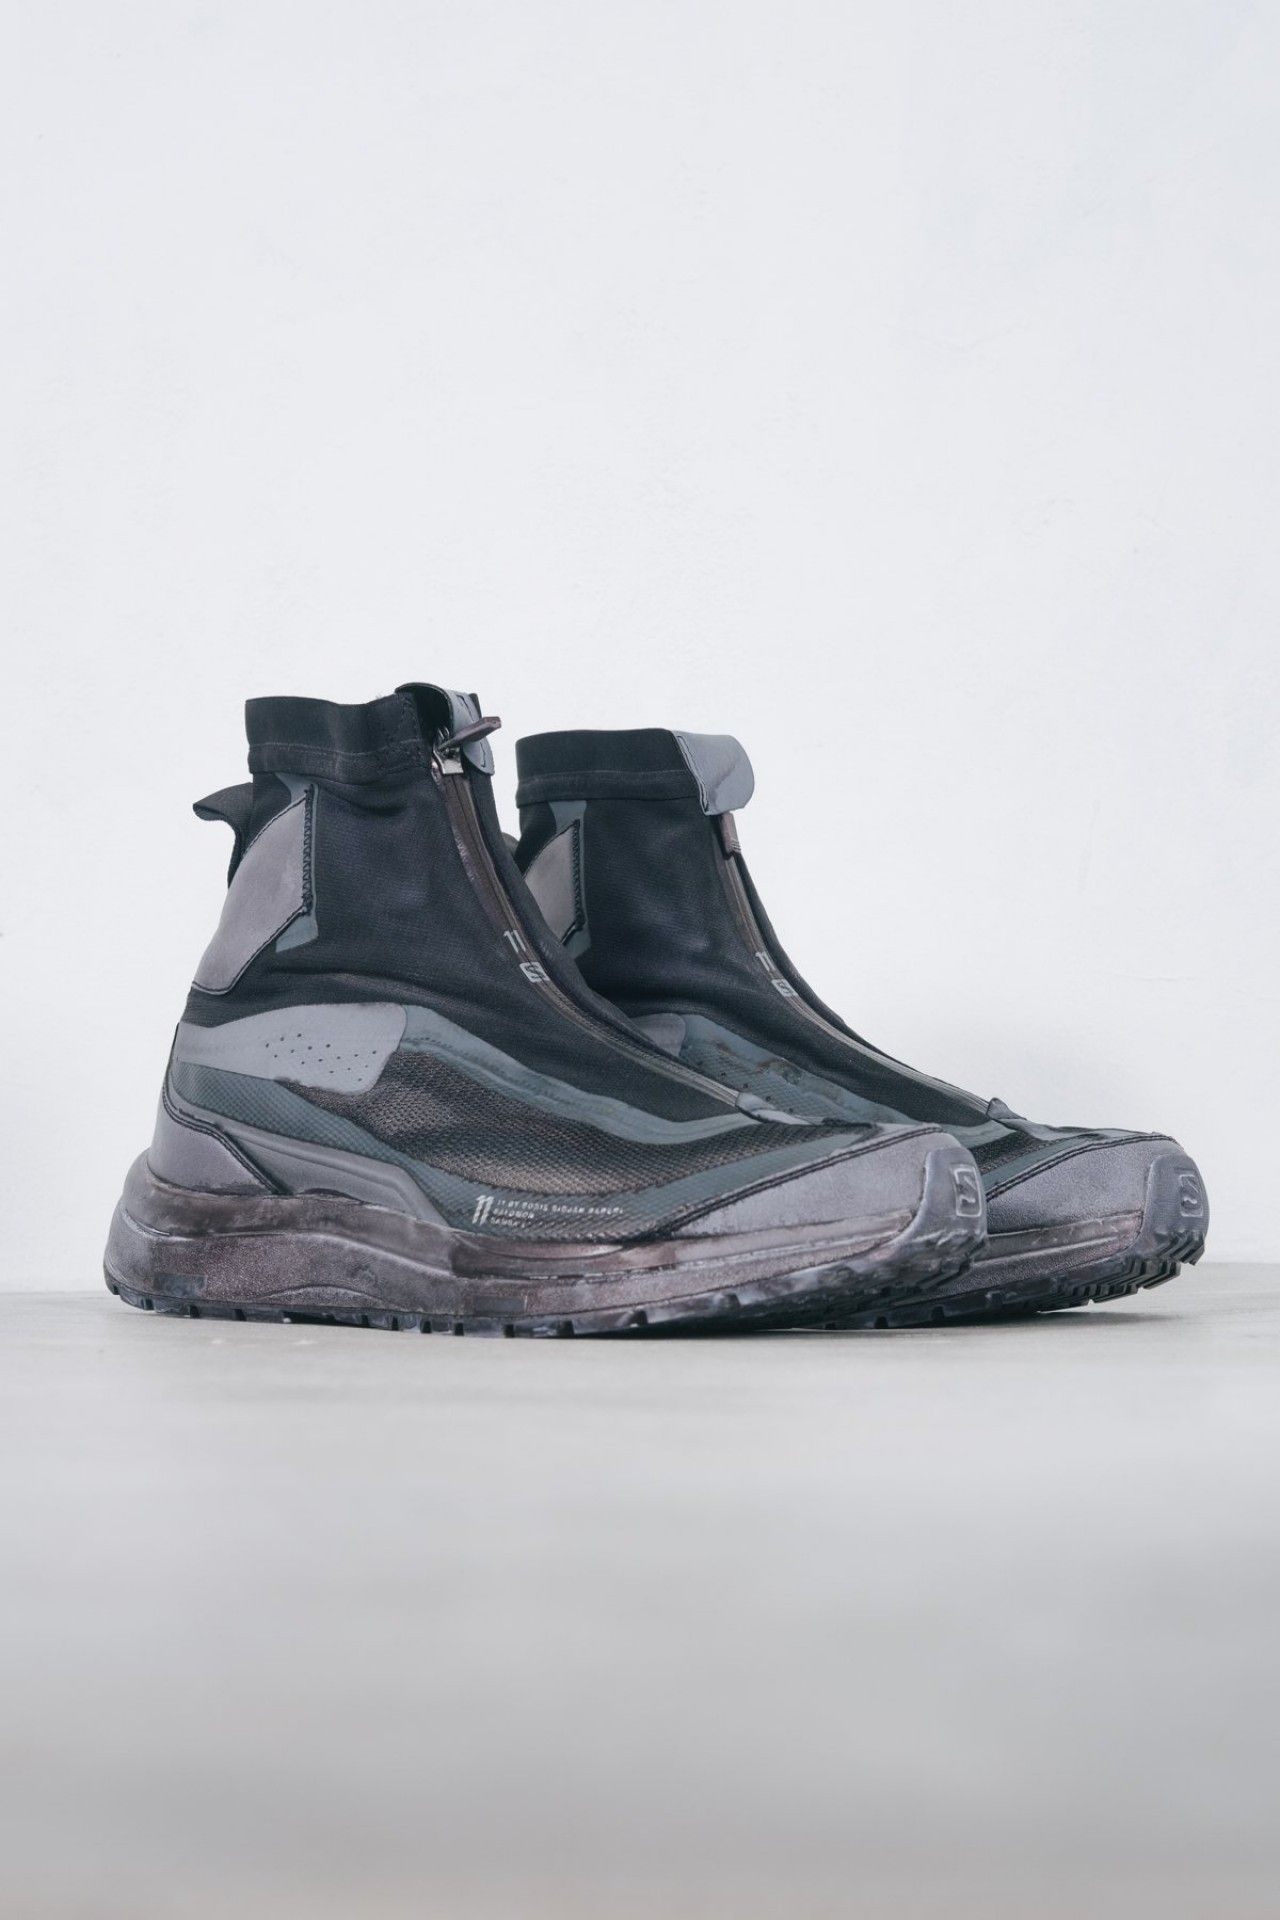 boris bidjan saberi in 2019 | Shoes sneakers, Fashion shoes